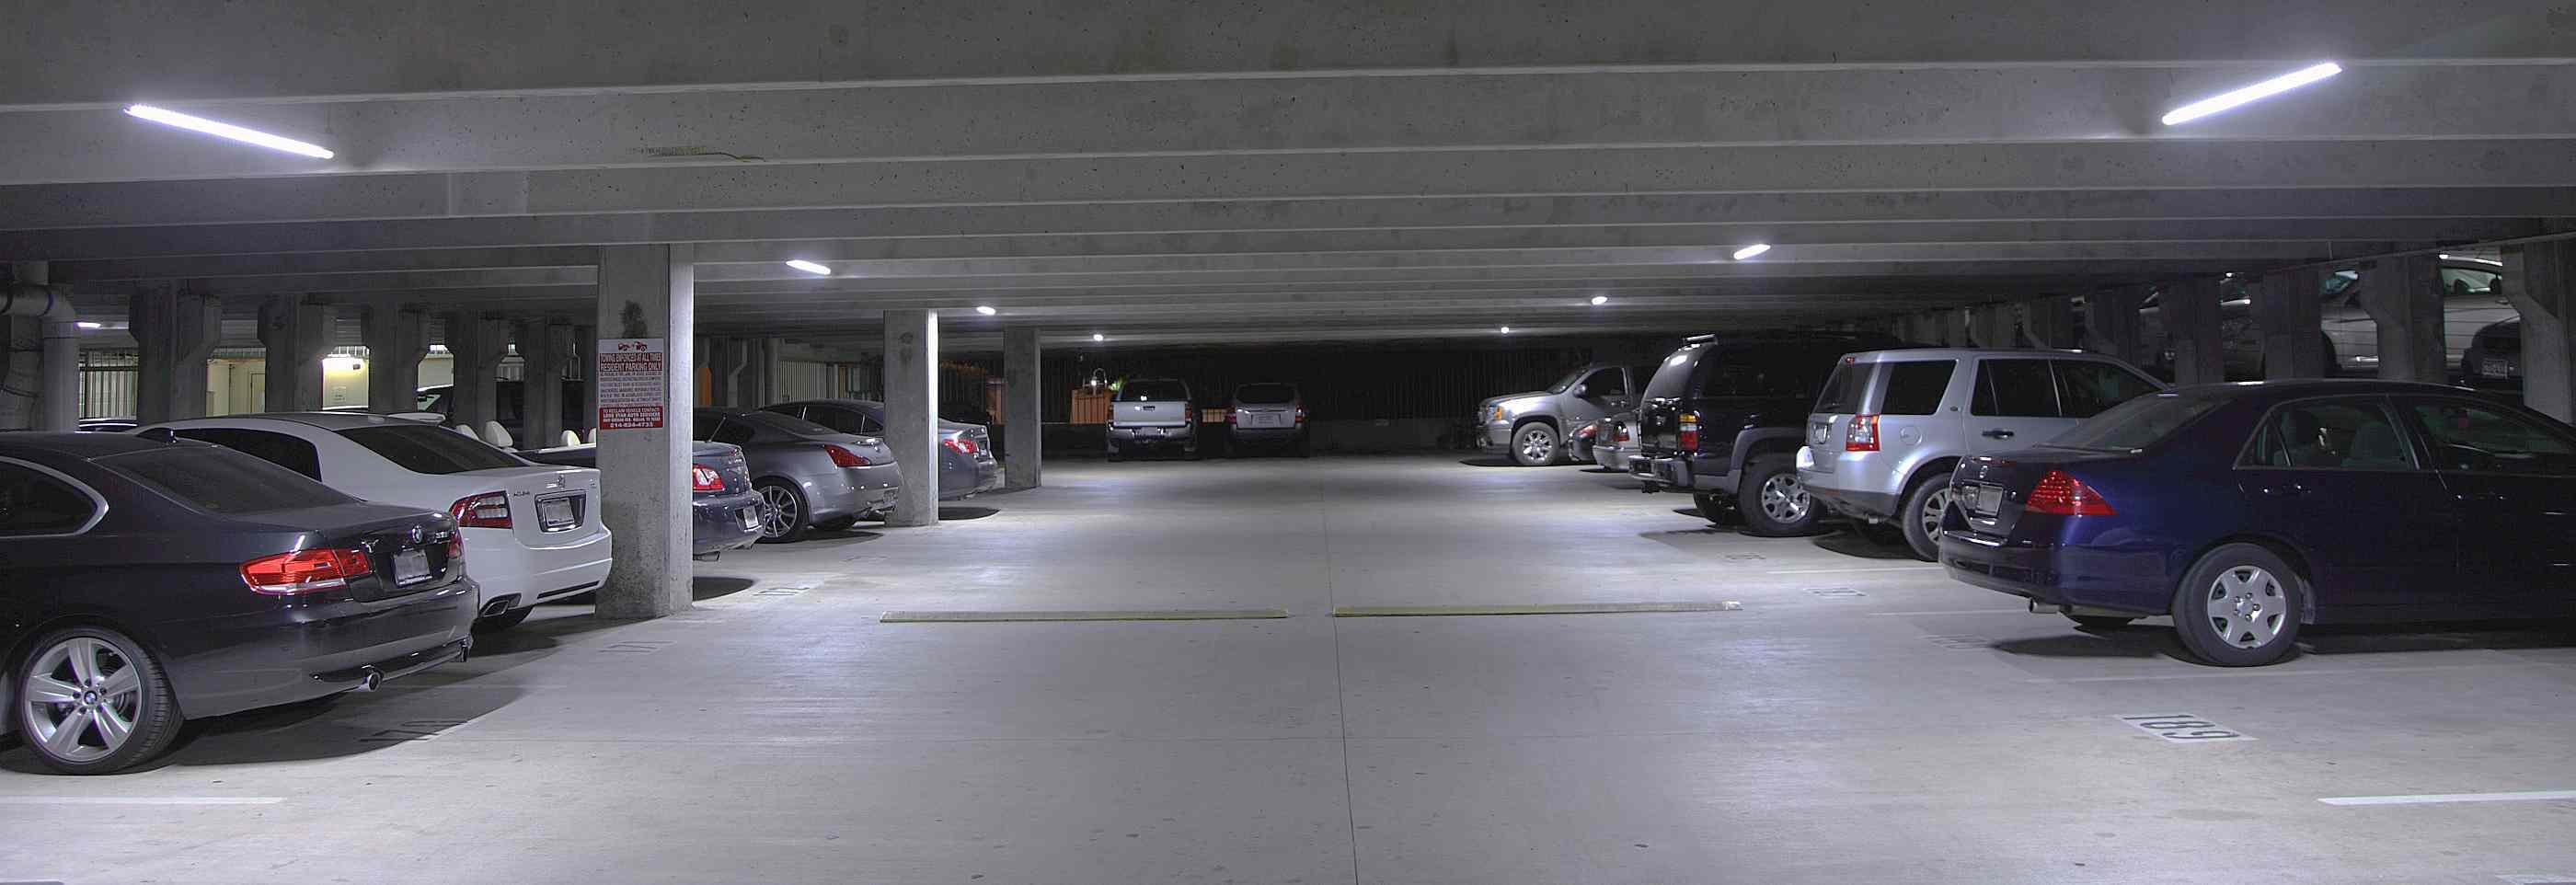 Ledinitaly led luce intelligente for Pianificatore di layout di garage